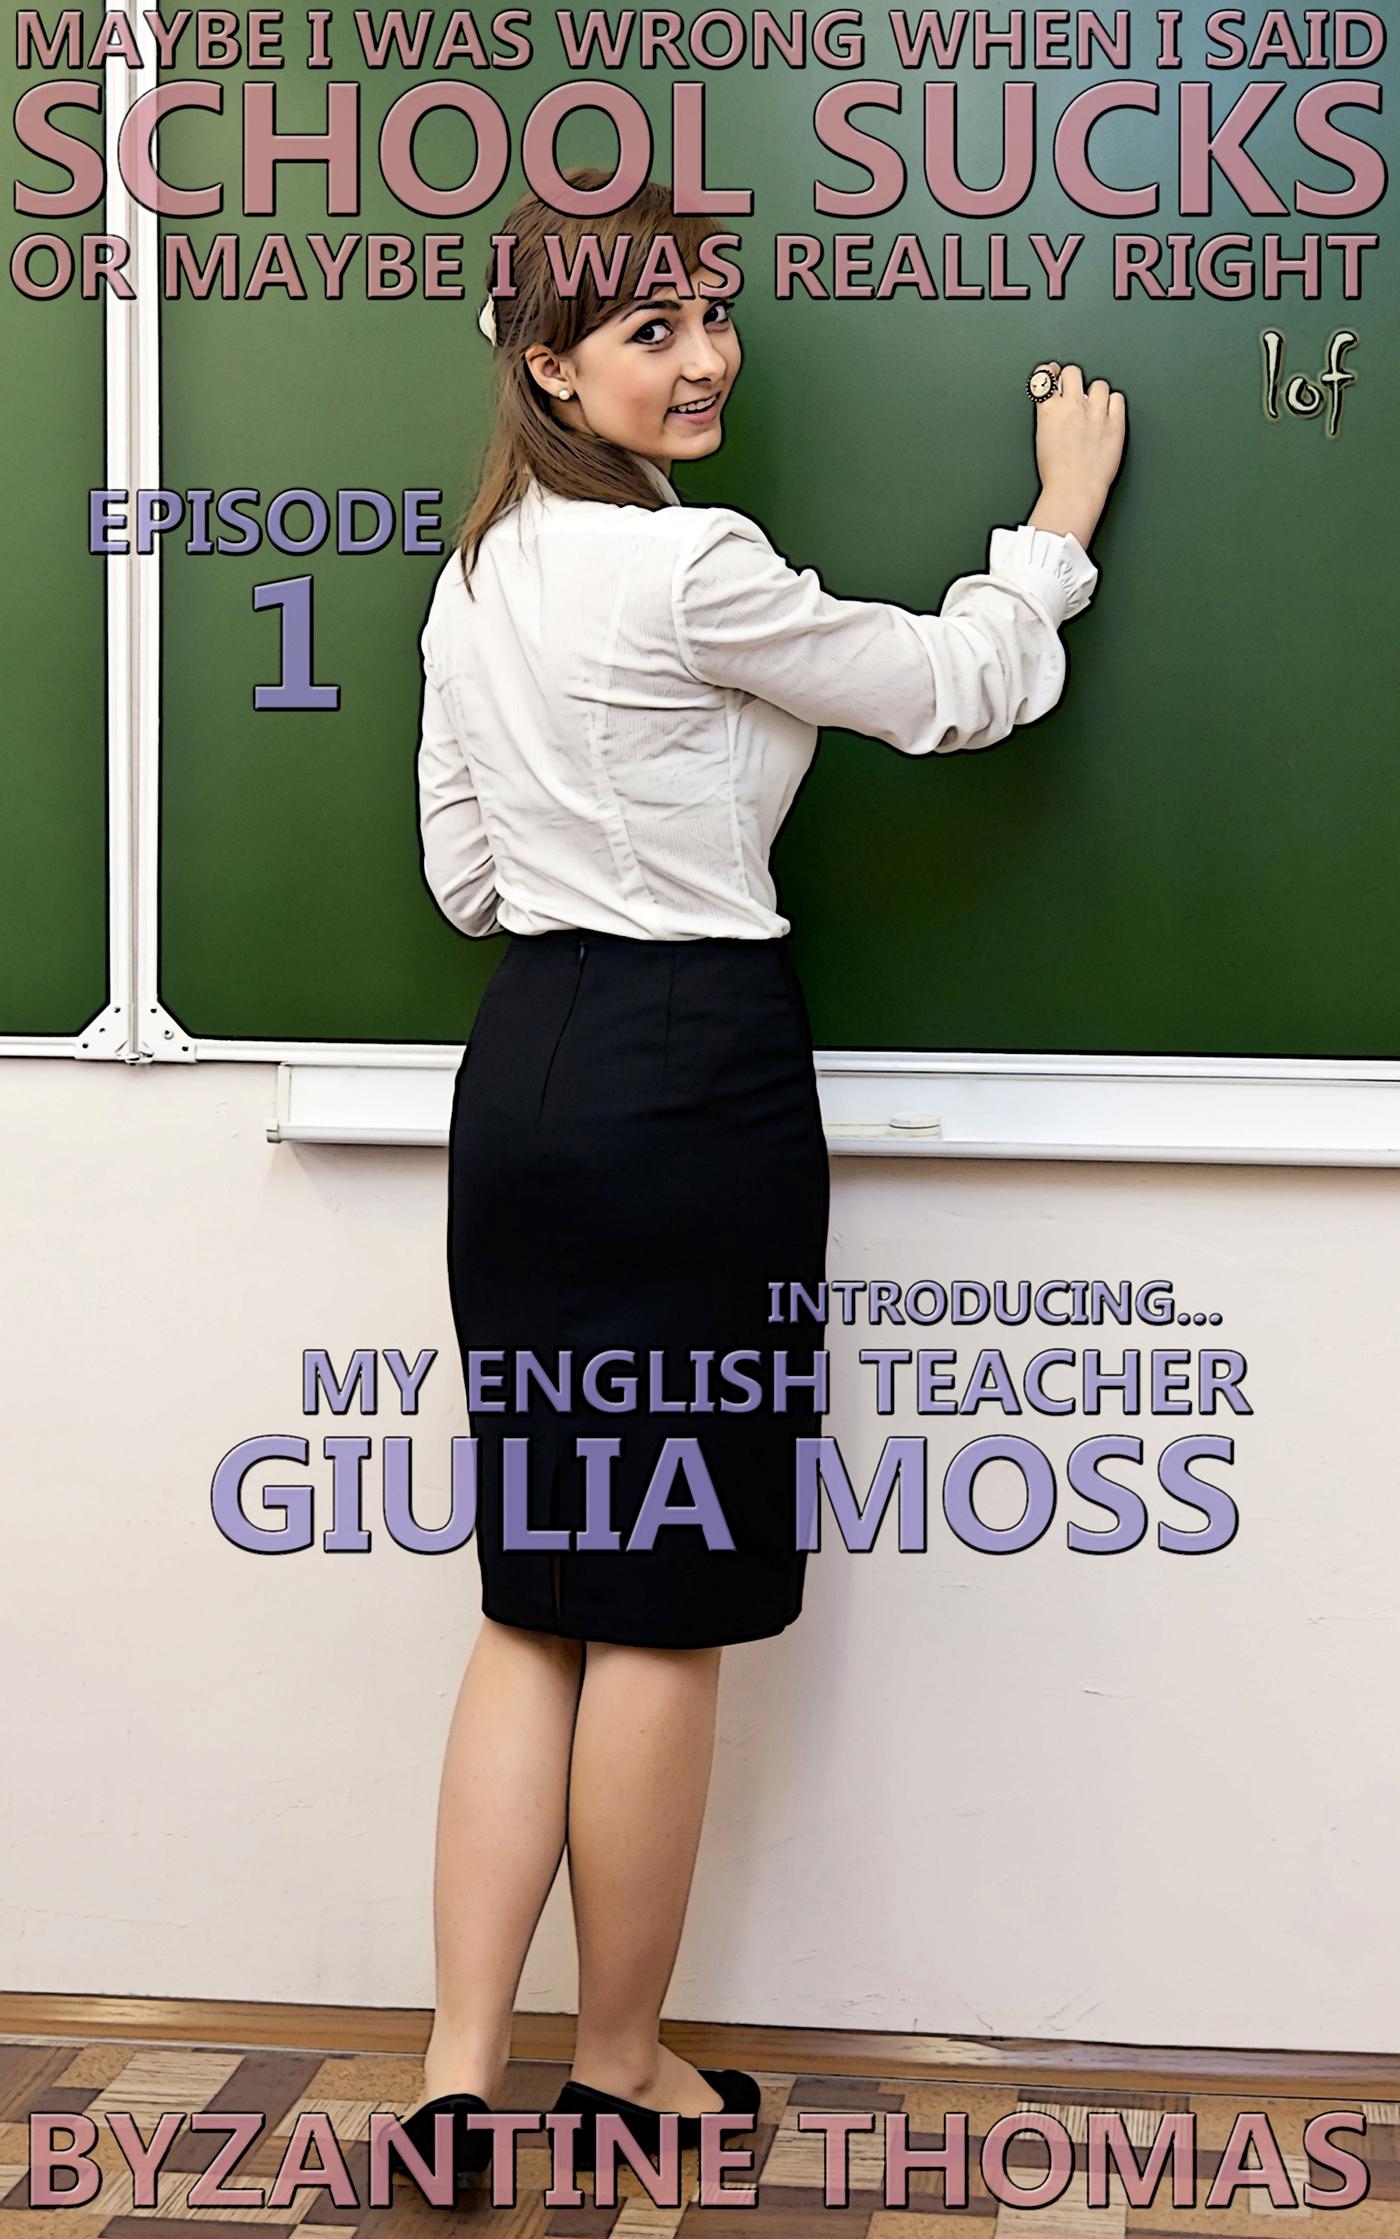 LOF New Release: School Sucks: Episode 1 (Introducing My English Teacher Giulia Moss)